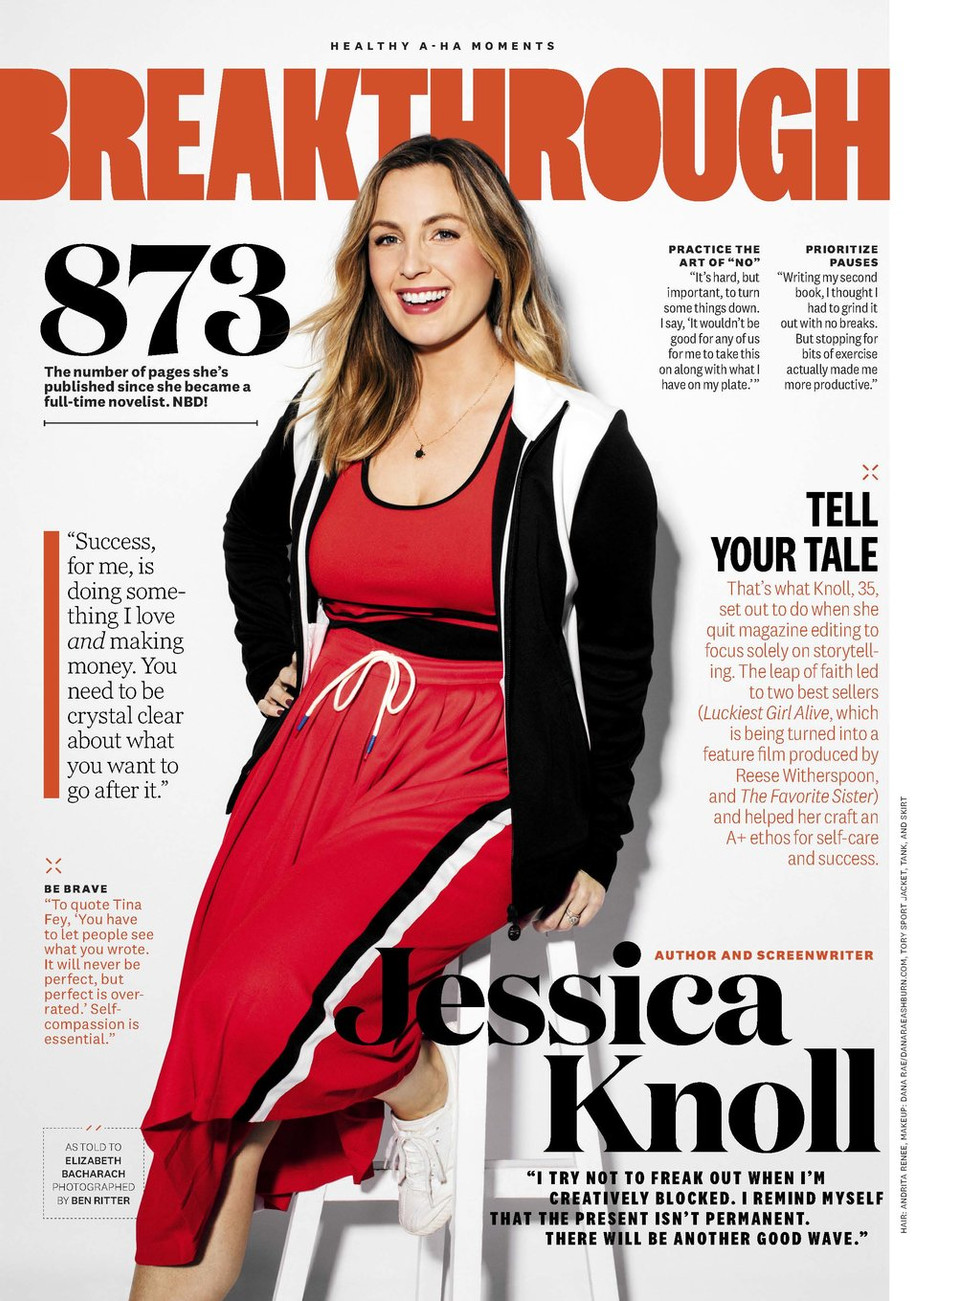 Jess+Knoll+Breakthrough.jpg